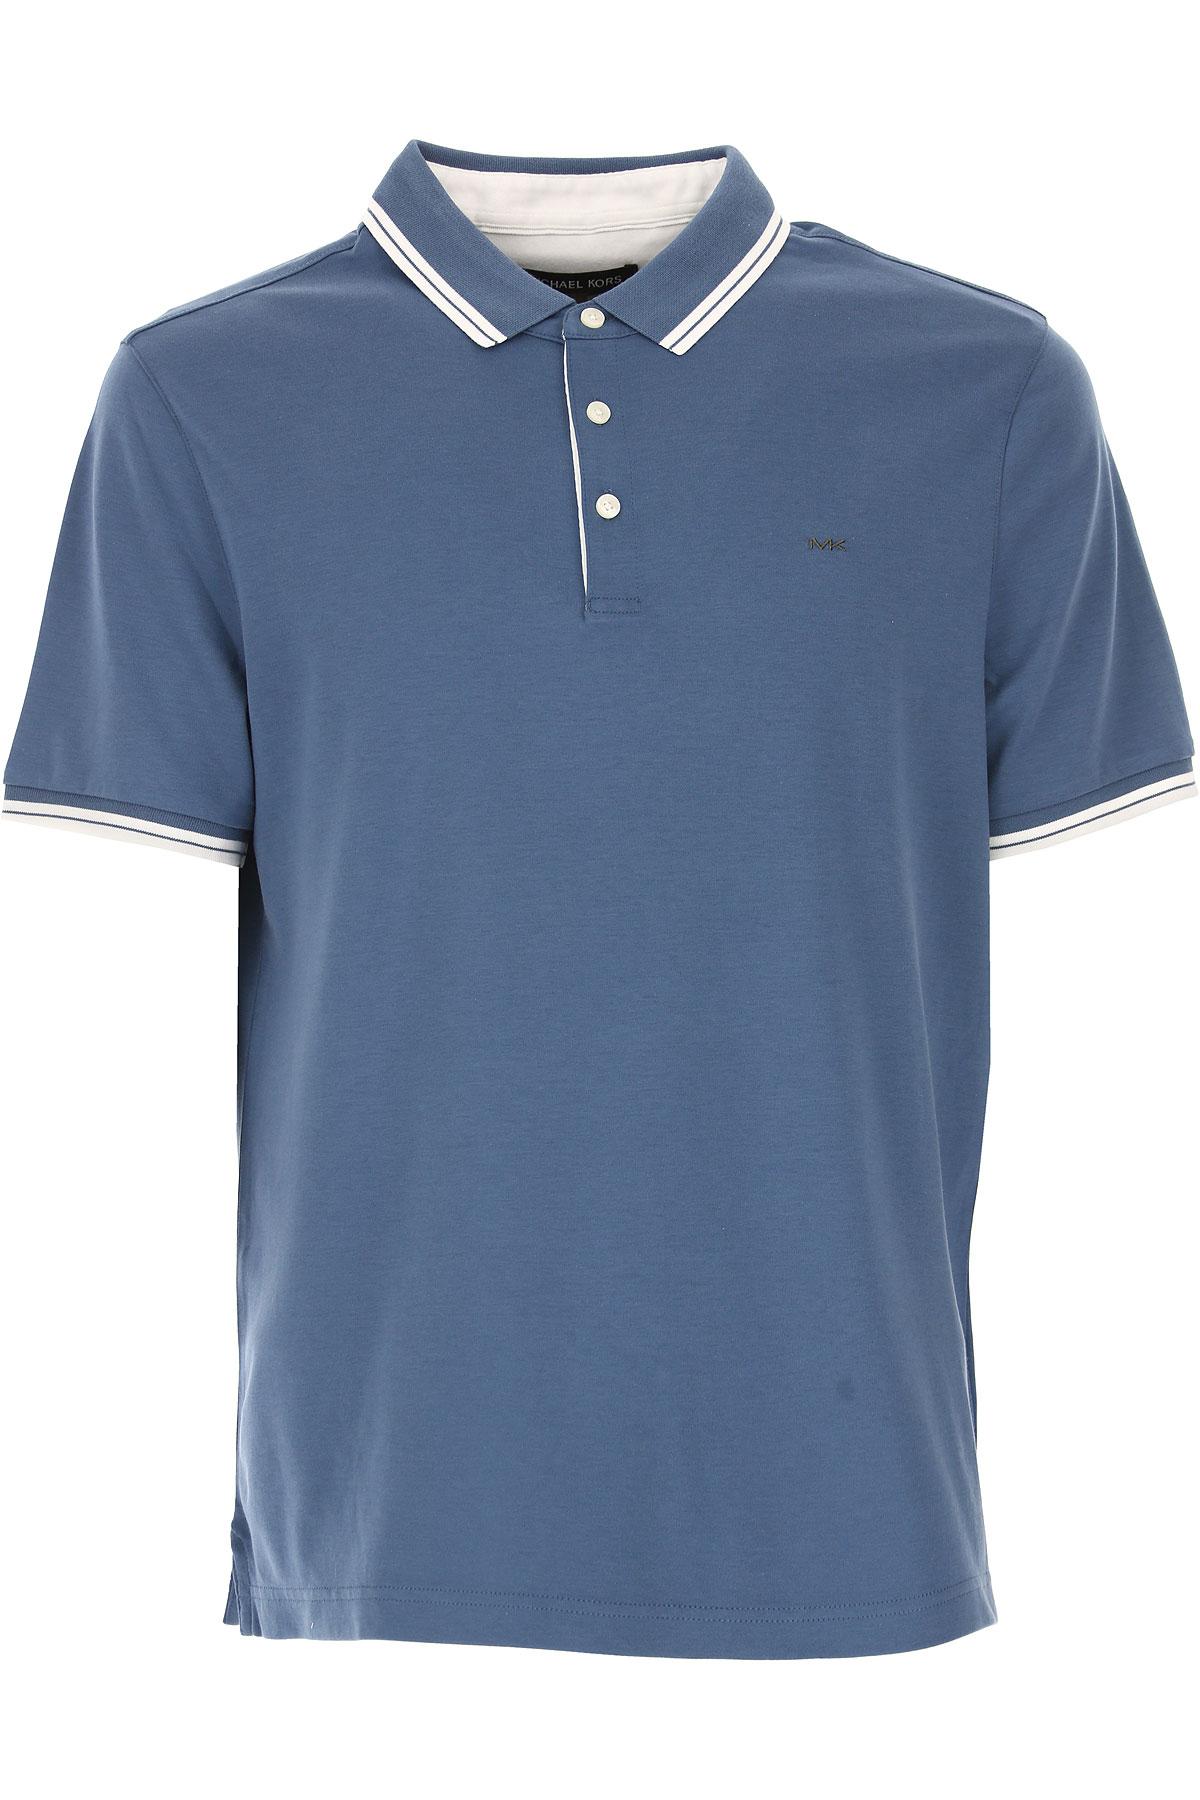 Michael Kors Polo Shirt for Men On Sale in Outlet, Bluette, Cotton, 2019, M S